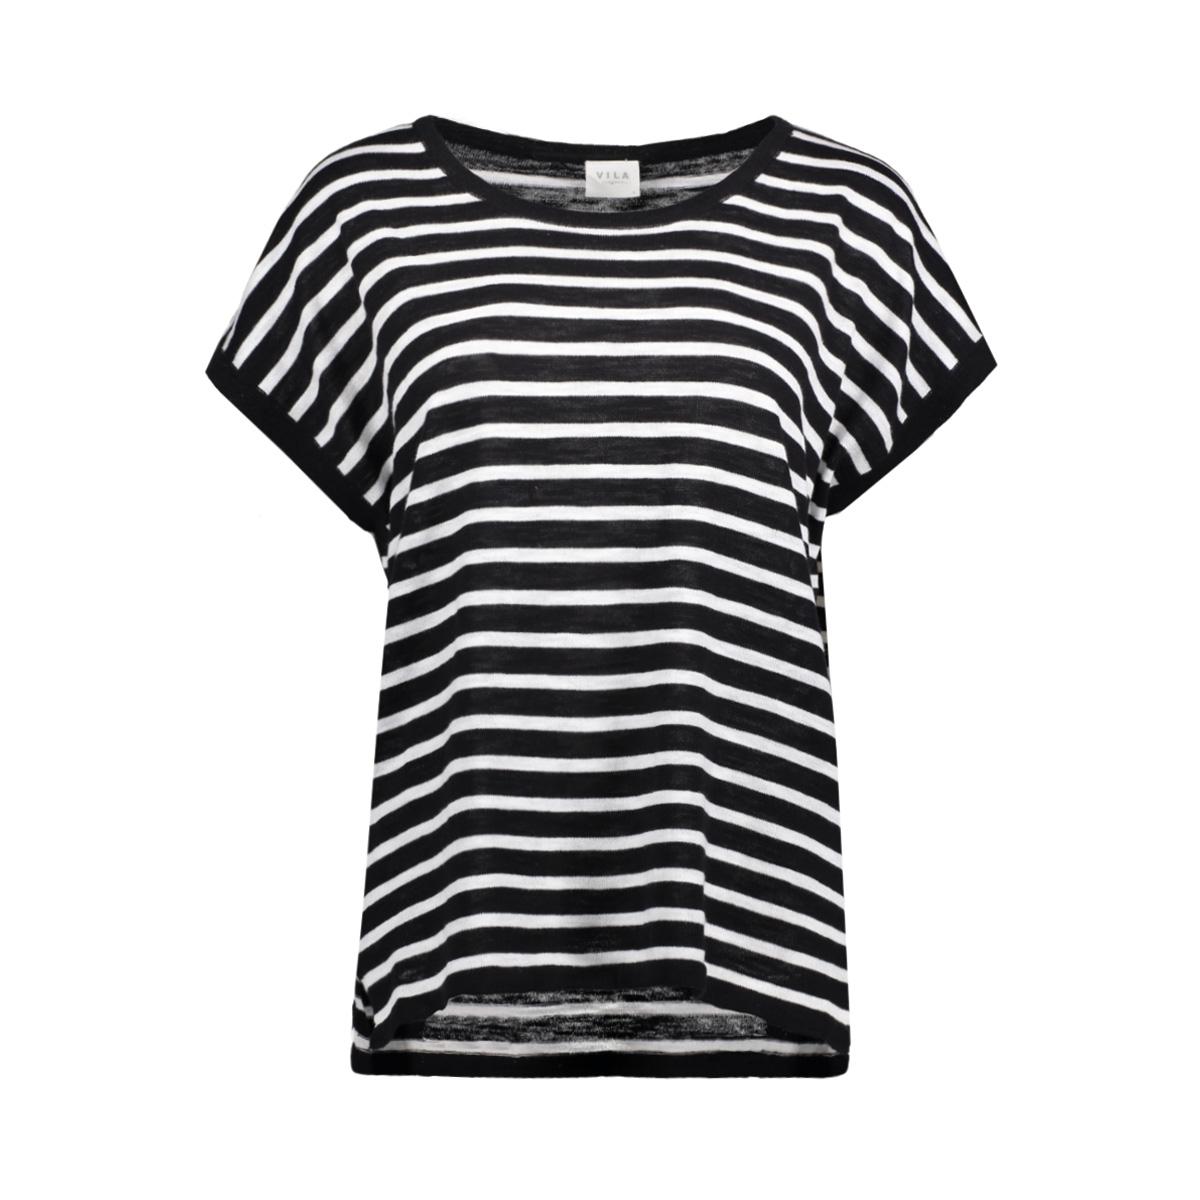 vistarly stripe s/s knit top/1 14043689 vila t-shirt black/cloud danc